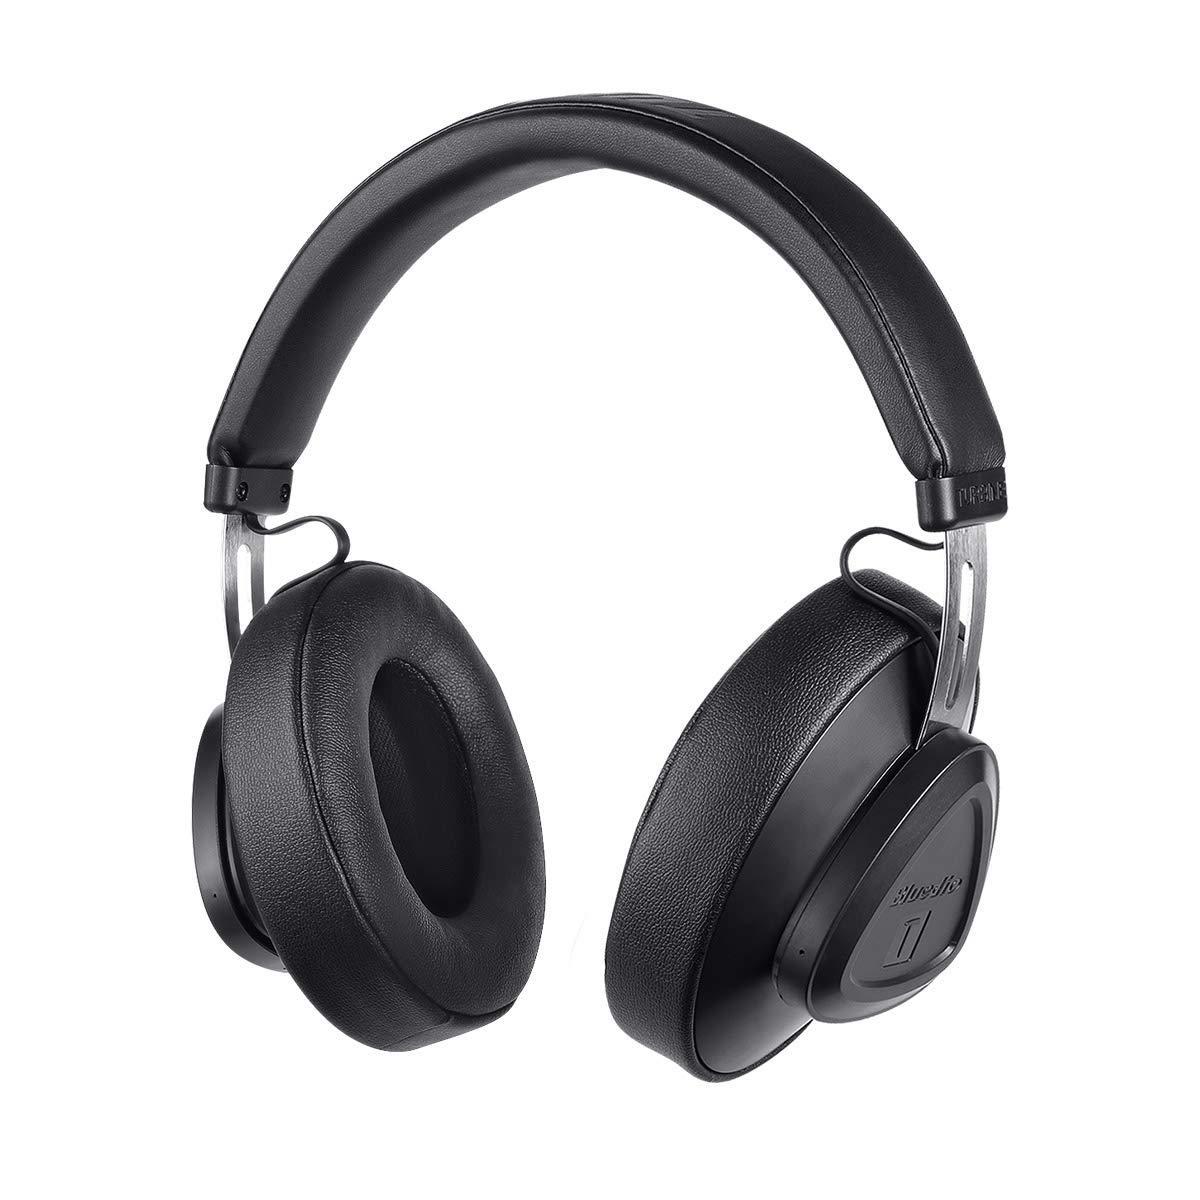 Bluedio A Air Series Bluetooth ヘッドホン ワイヤレスヘッドセット イヤホン(黒)